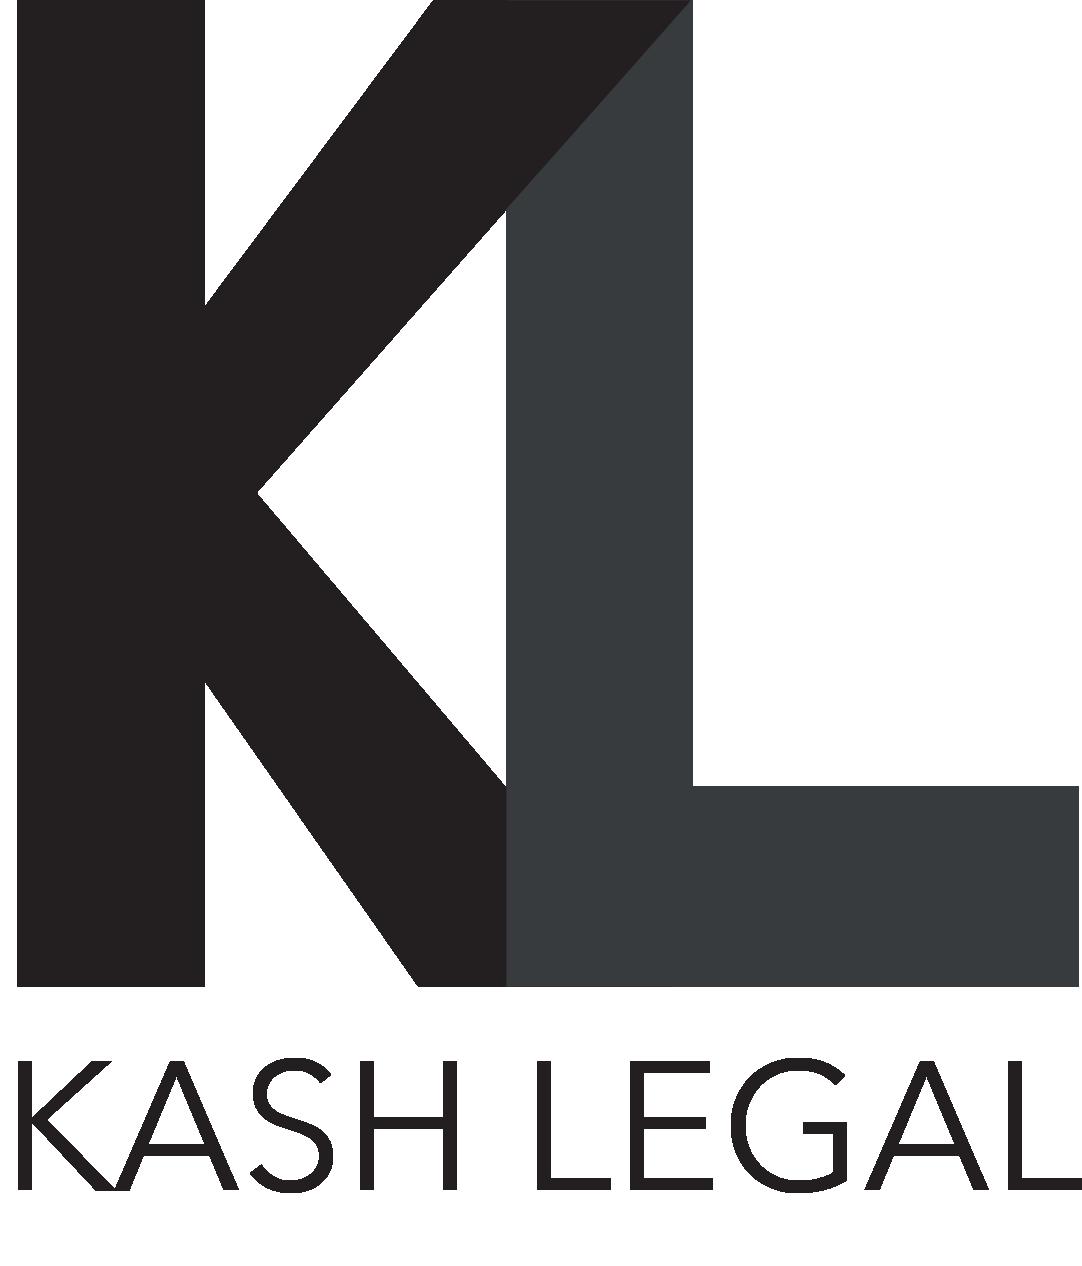 Kash Legal